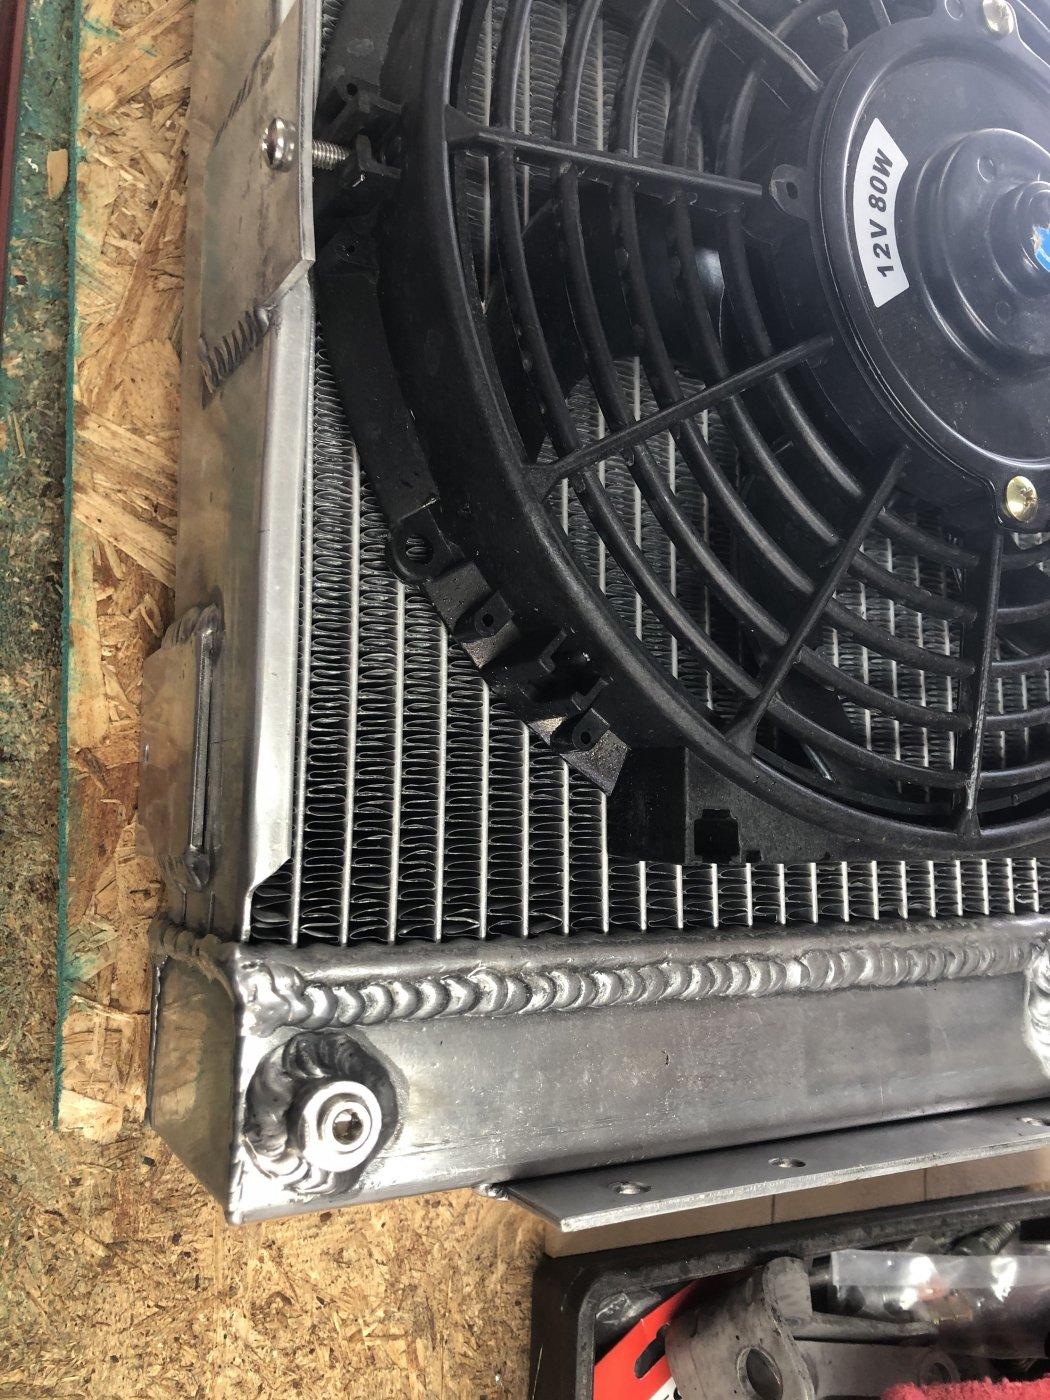 Radiator Vent.jpg